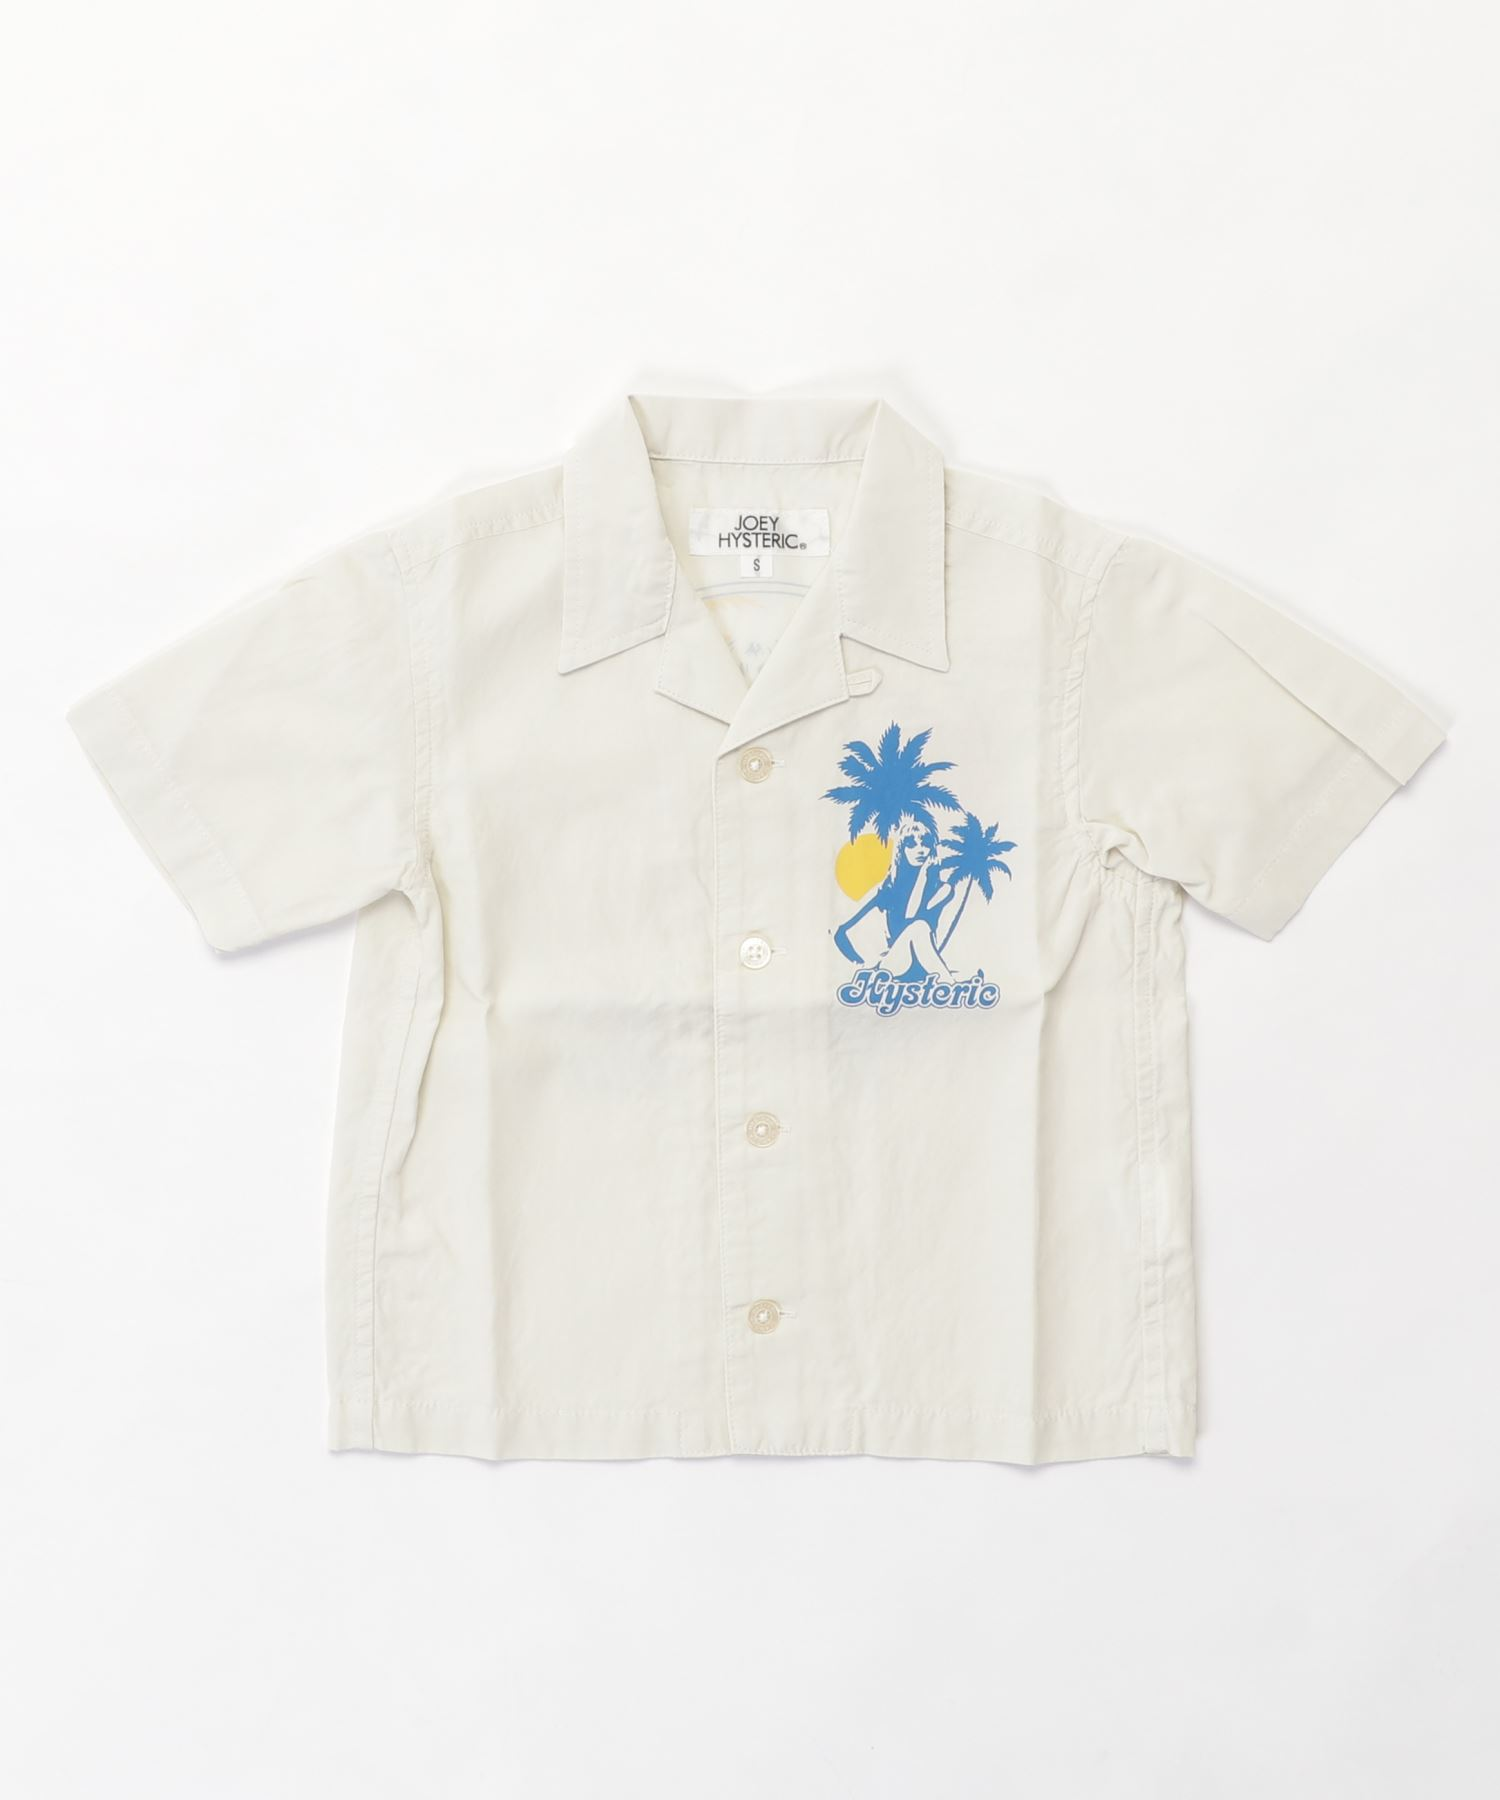 ISLAND DAYS pt 半袖オープンカラーシャツ【S/M】